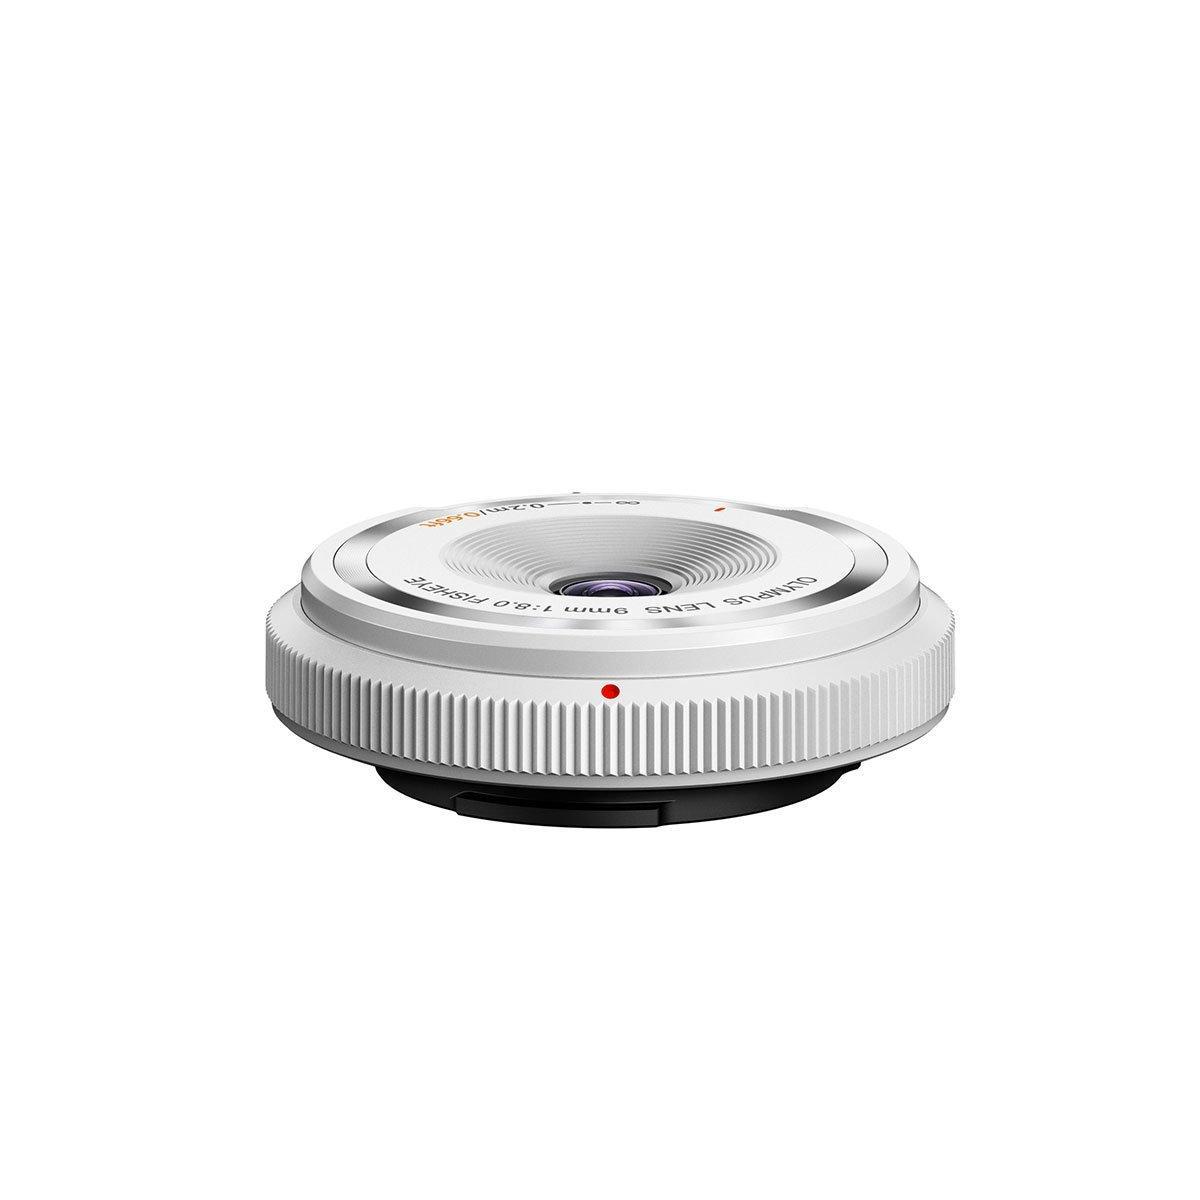 Olympus Body cap lens 9mm F8.0 fisheye valkoinen